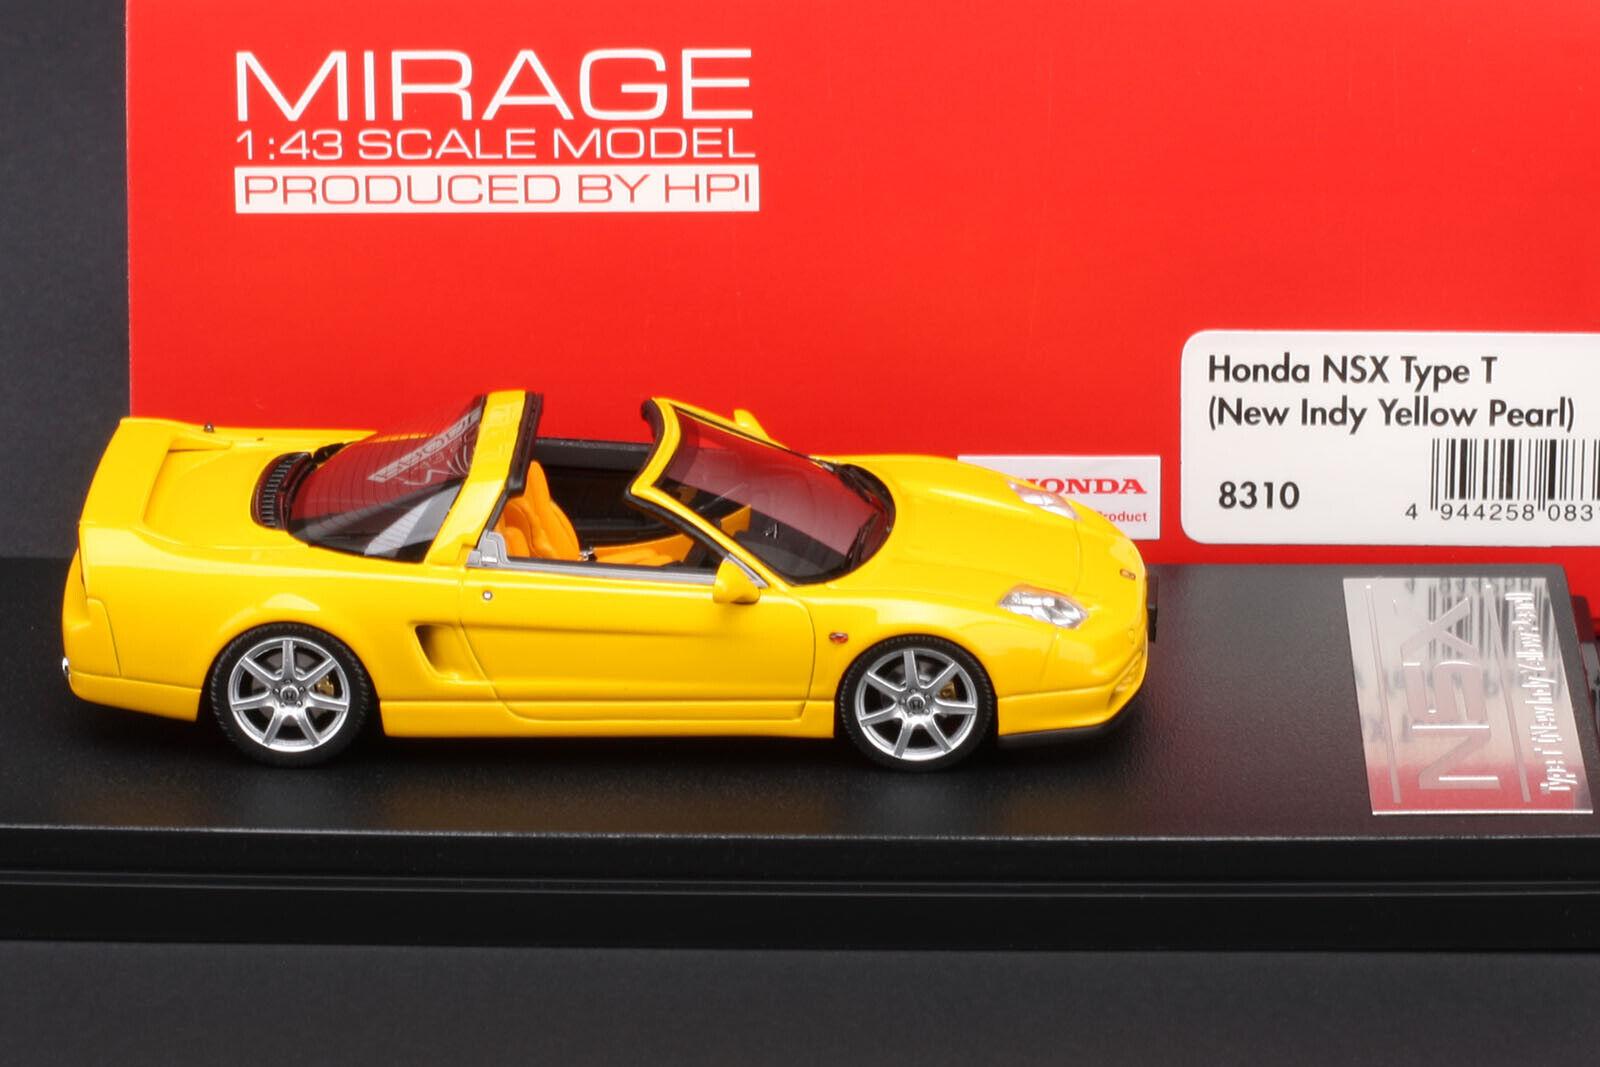 Honda Nsx Type T-nuevo Indy giallo Perla-Hpi Resina Acura NSX 1 43